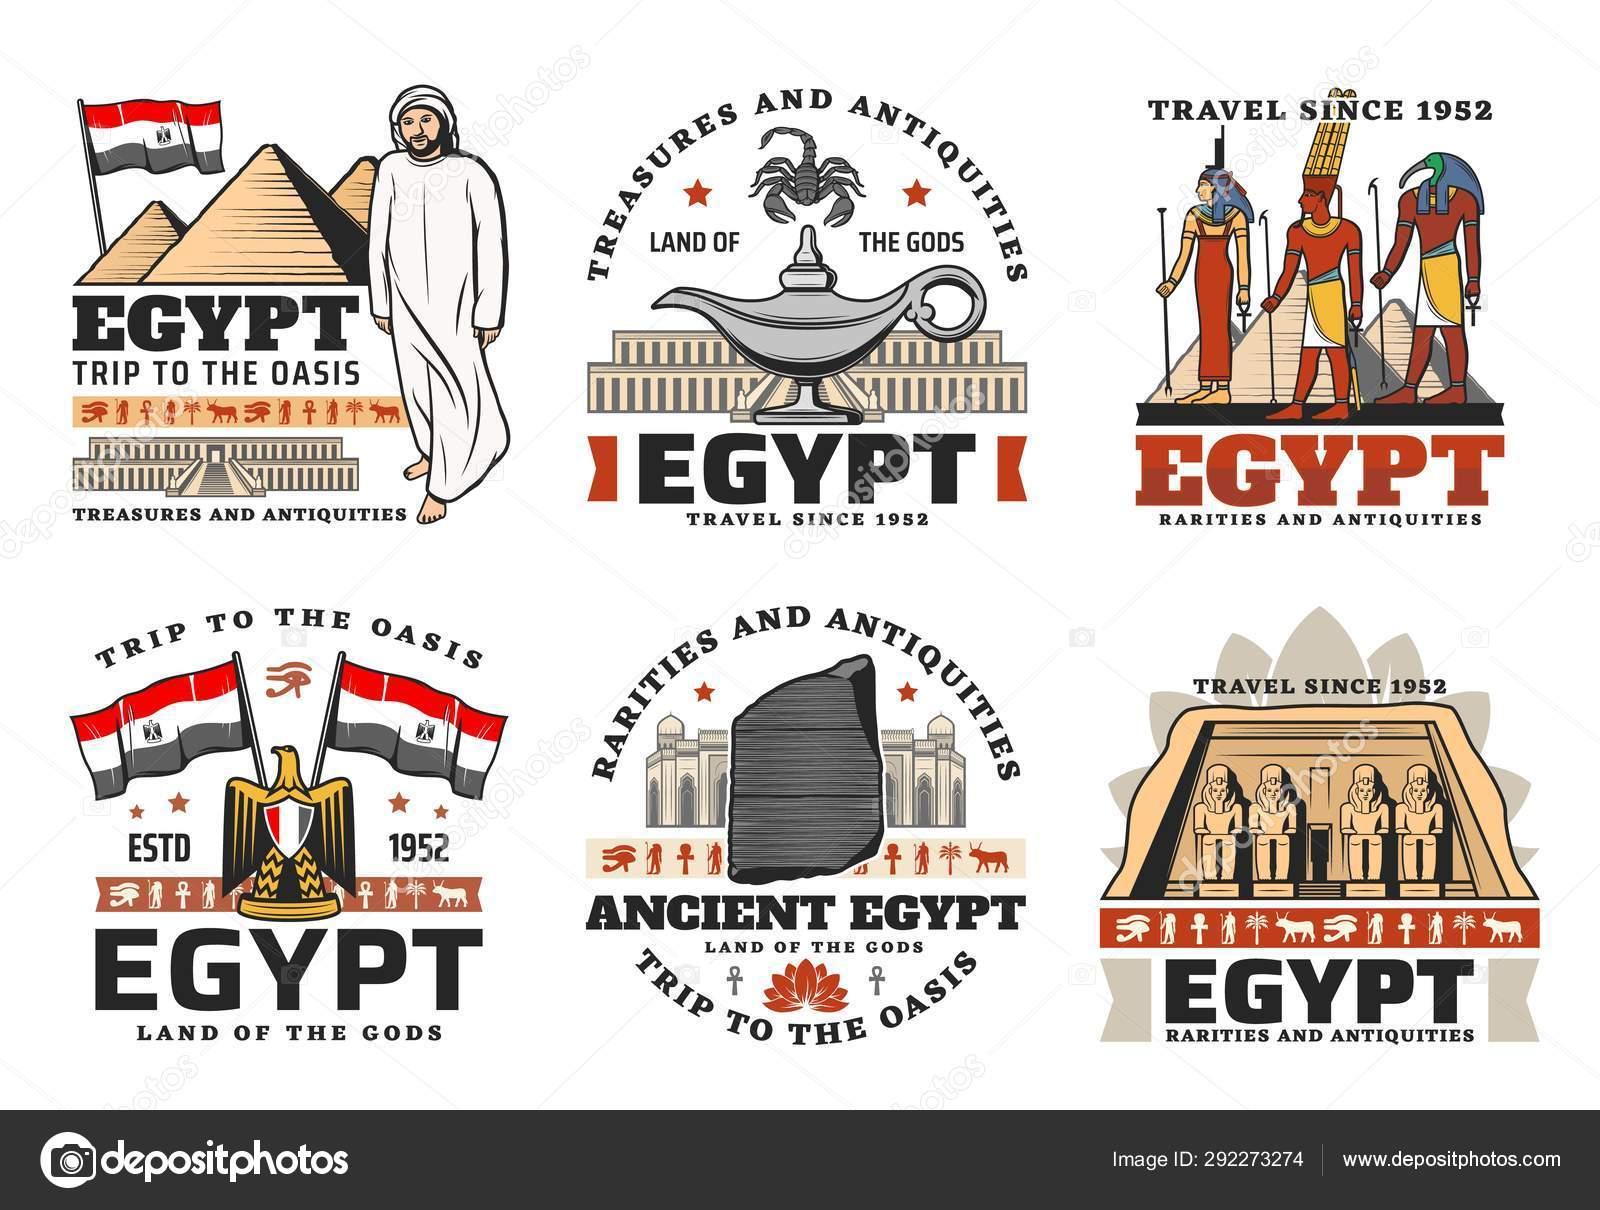 Aufnäher Anubis Patch Pharao Ägypten Pyramiden